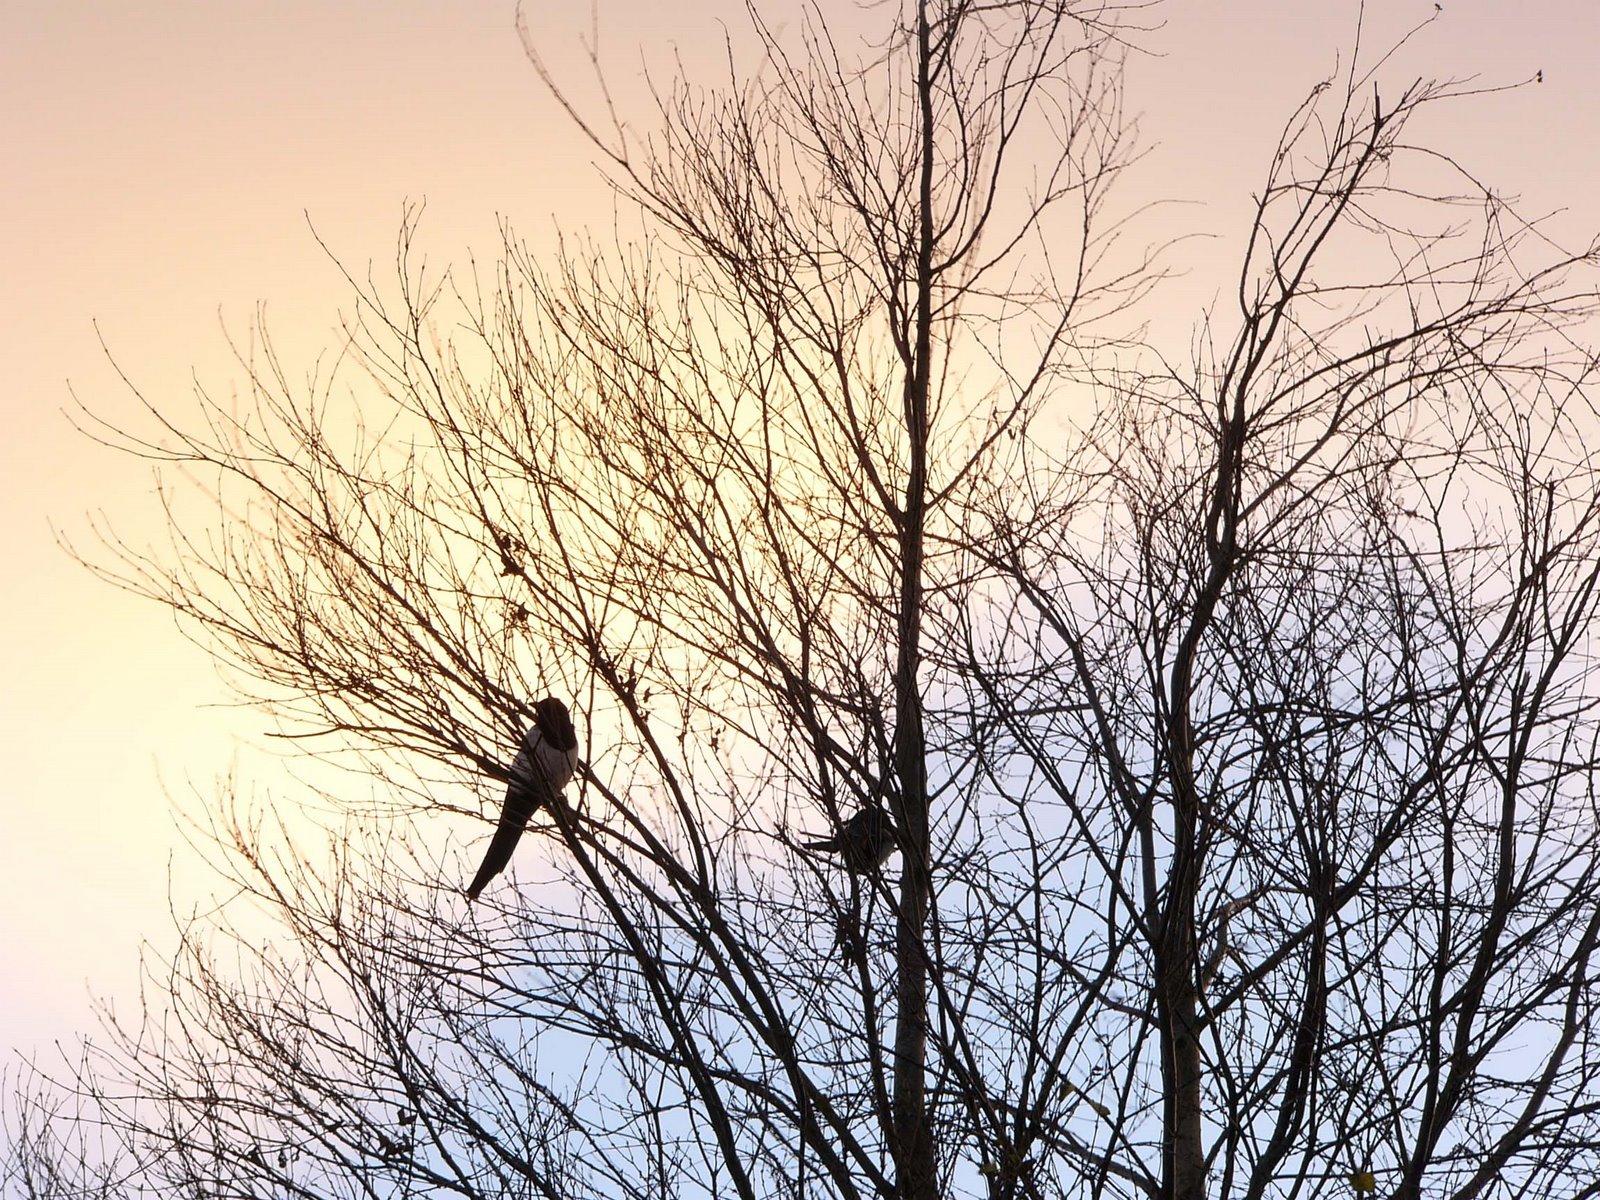 Stavanger Photos Birds On The Tree 1600x1200